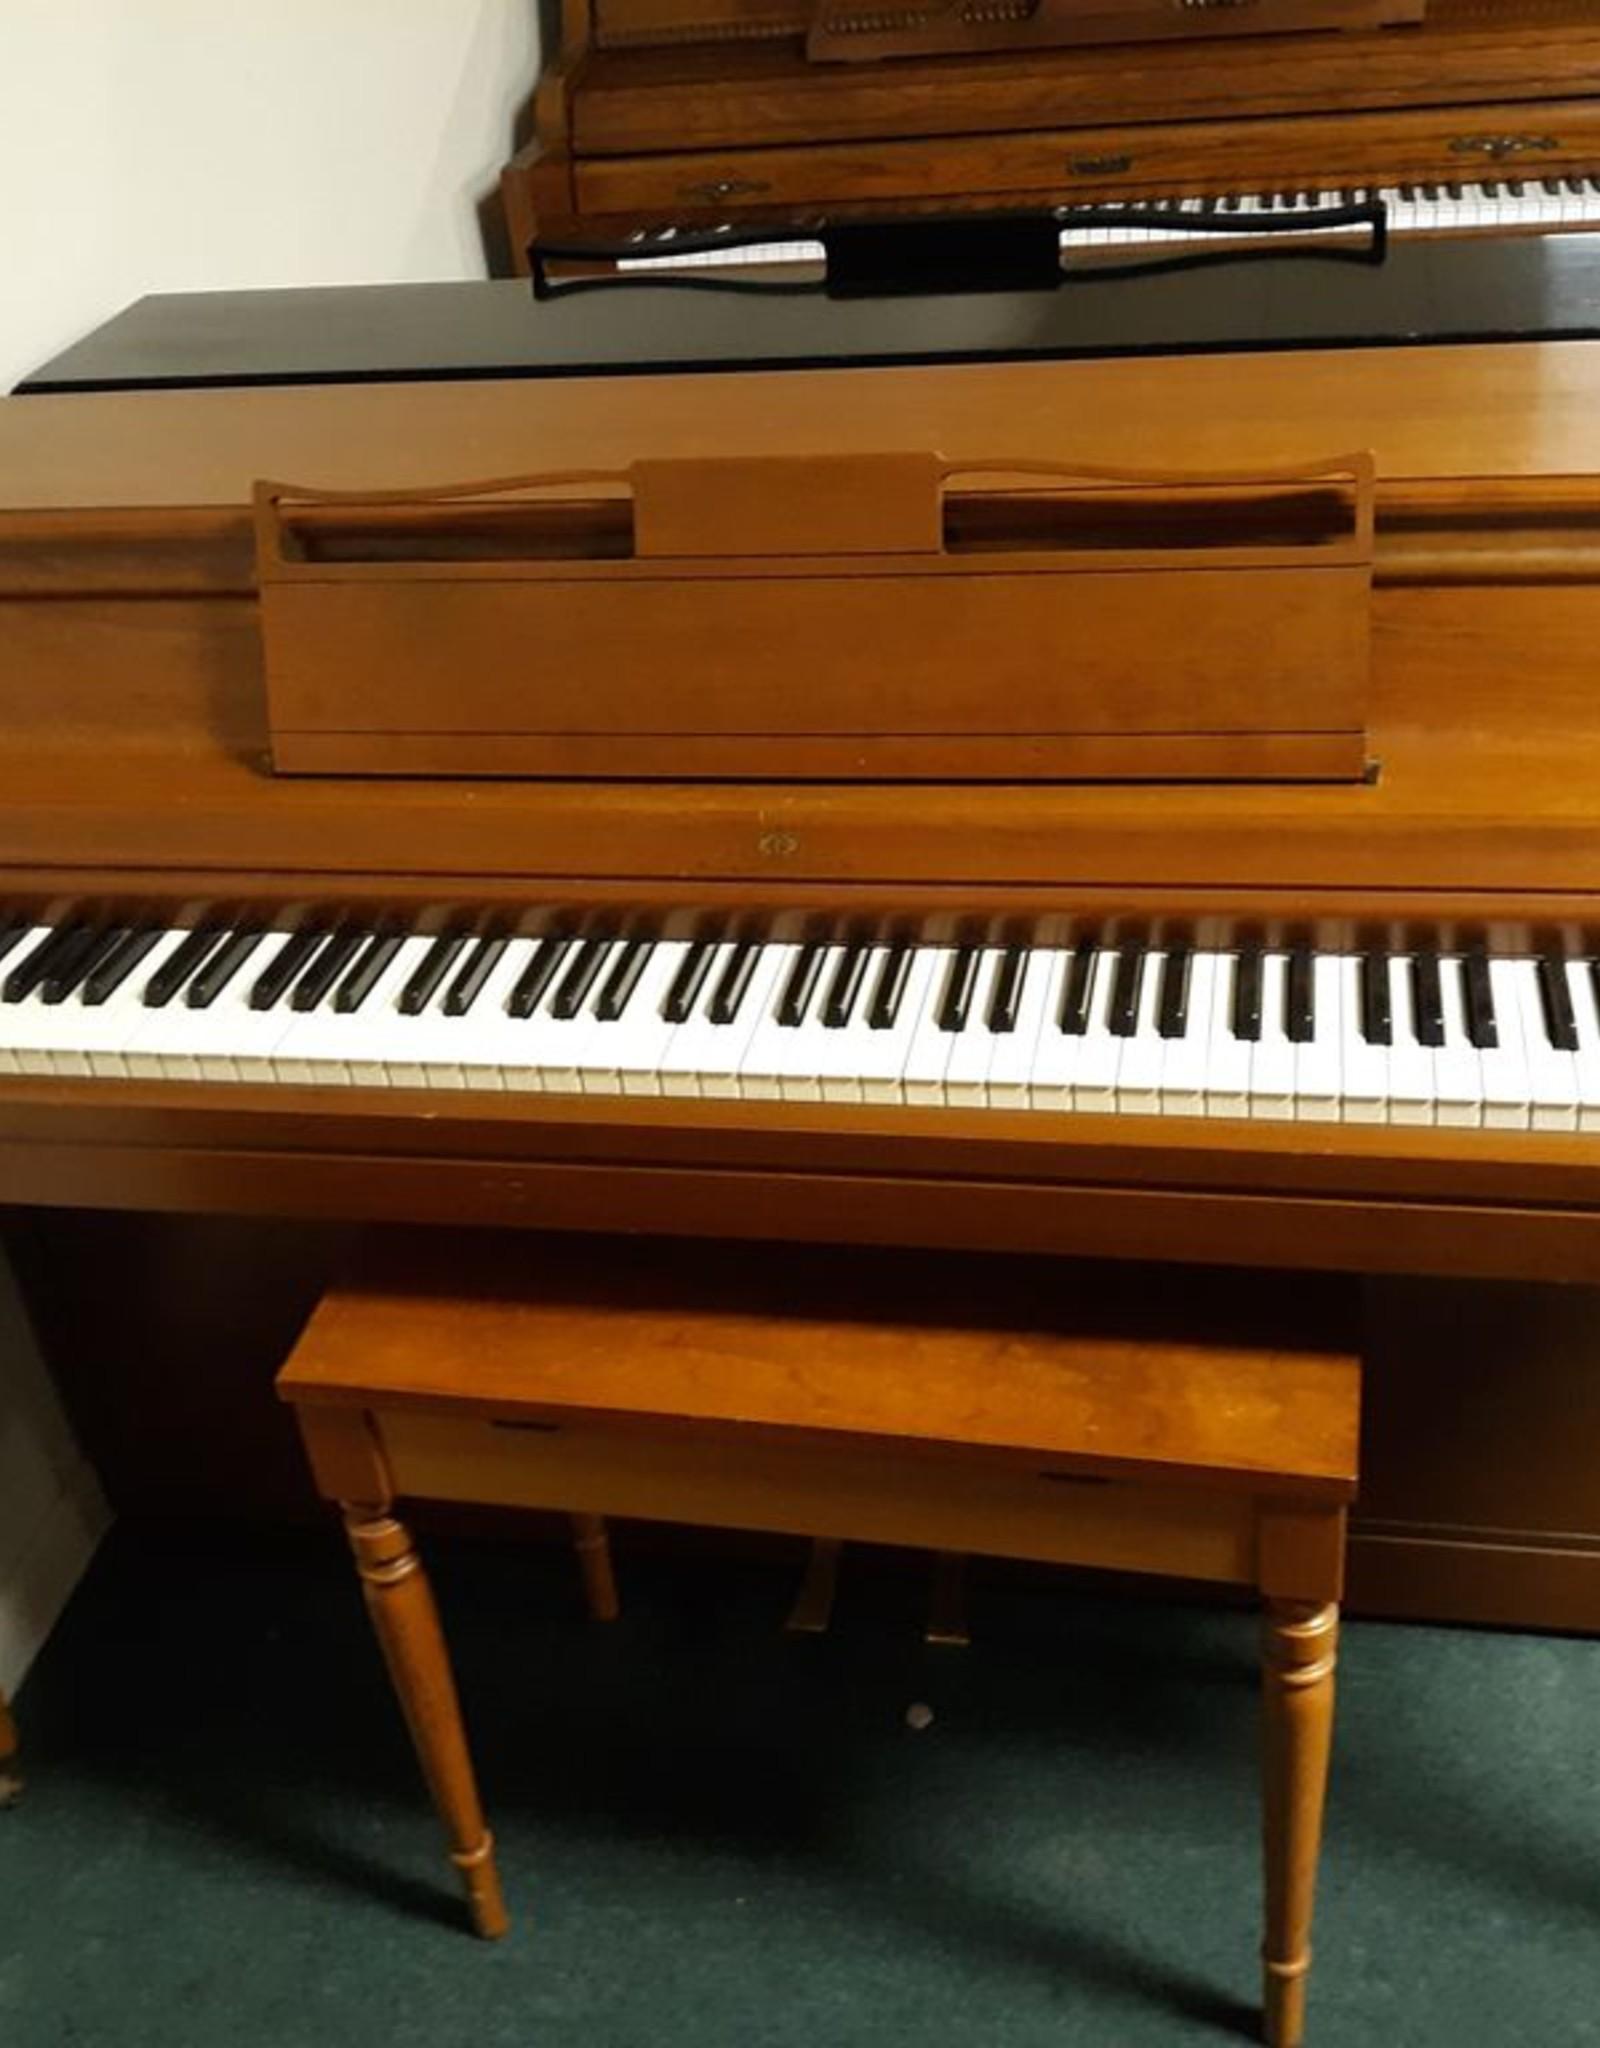 "Wurlitzer Wurlitzer Spinnet 37"" Vertical Piano (Pecan) (pre-owned)"